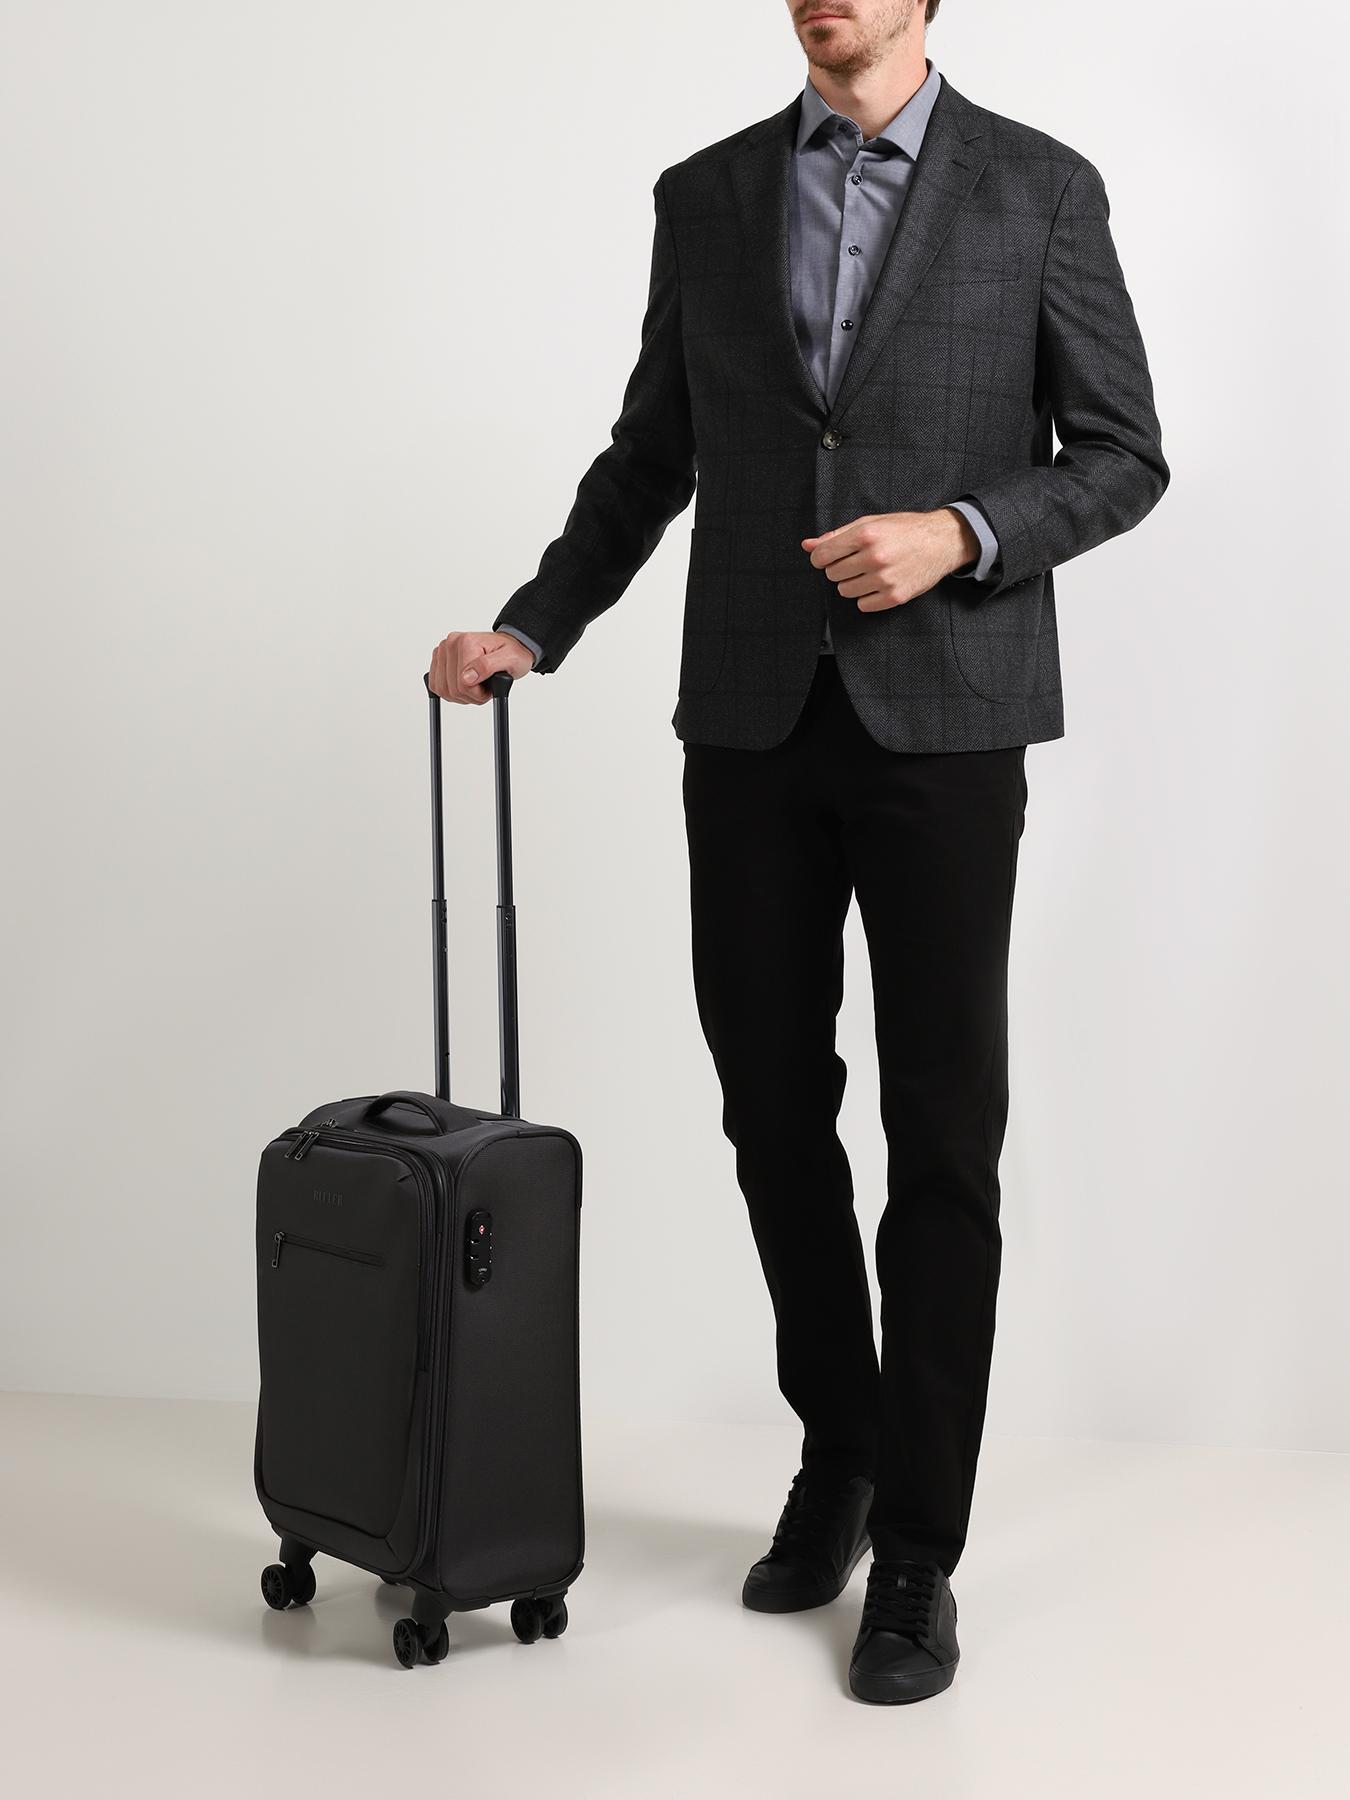 Чемодан Ritter Чемодан СТ 20 чемодан ritter чемодан rc 20